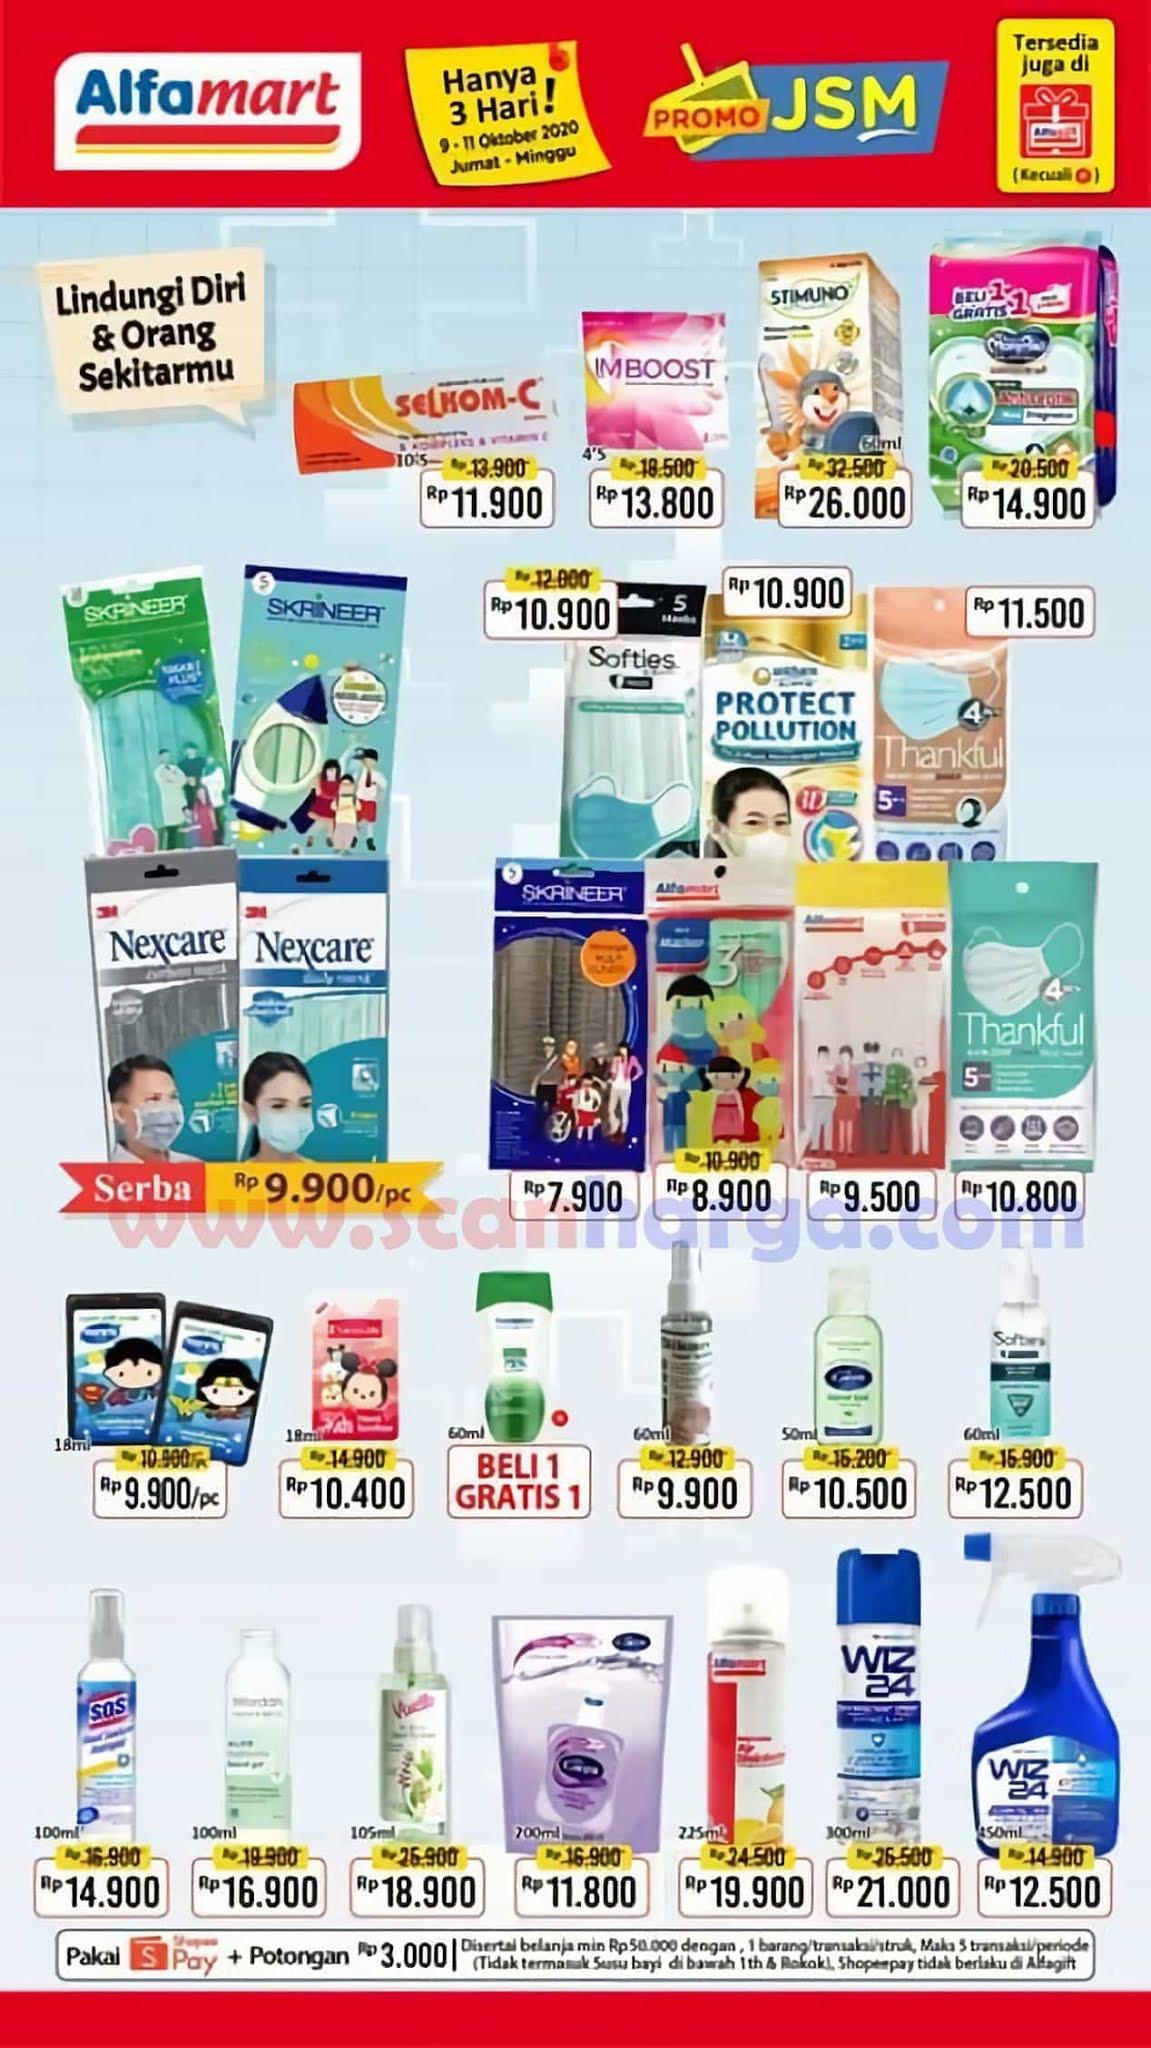 Katalog Promo JSM Alfamart Terbaru 16 - 18 Oktober 2020 ...